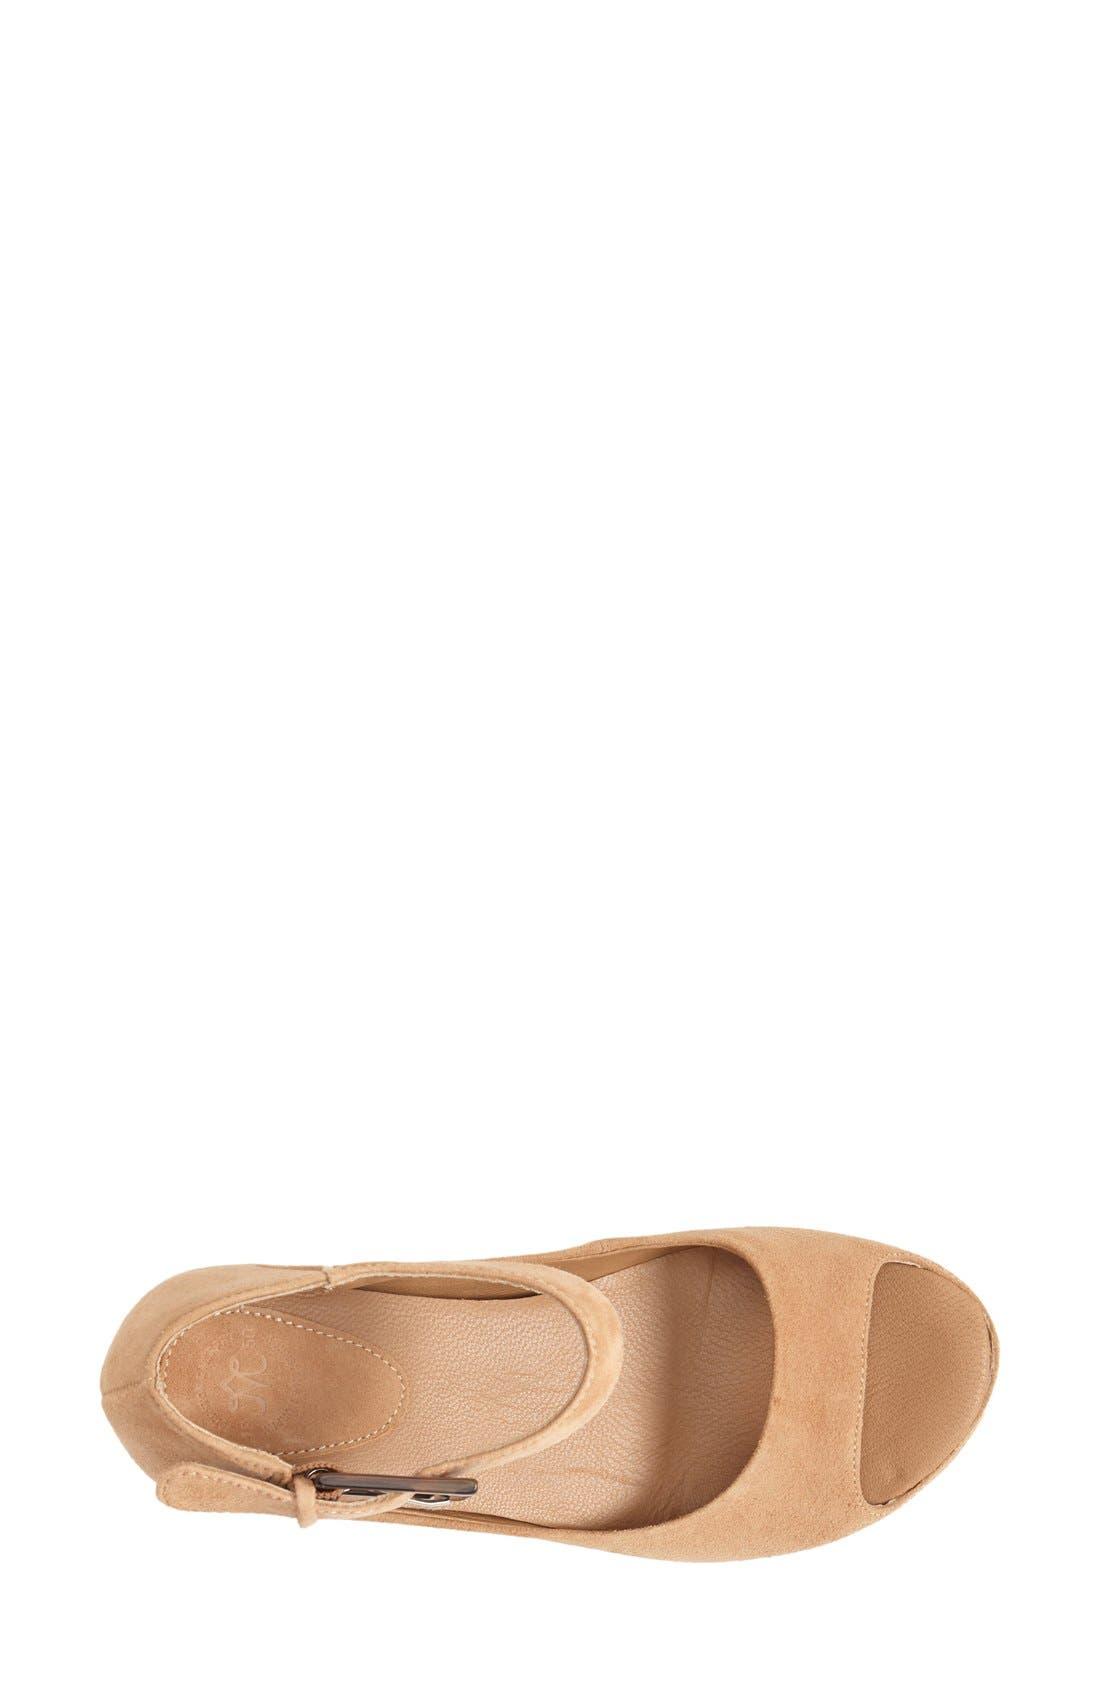 'Tricia' Ankle Strap Sandal,                             Alternate thumbnail 56, color,